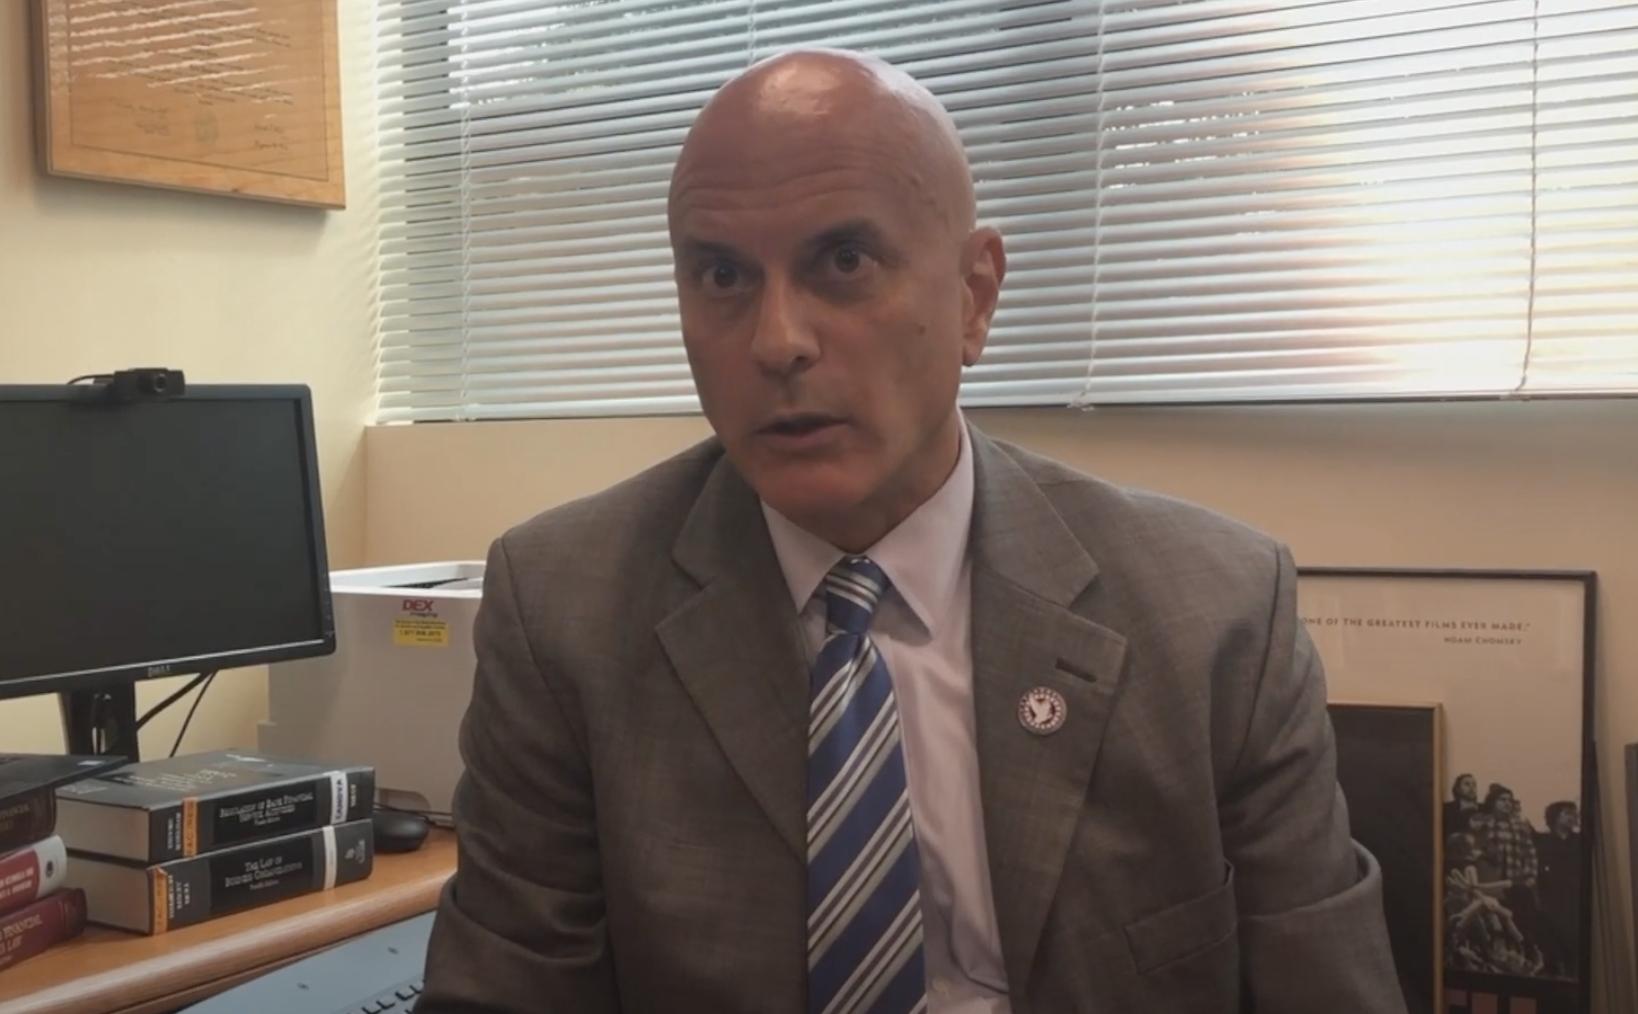 Progressive Tim Canova won't vote for Biden, supports President Trump's policies (Video)